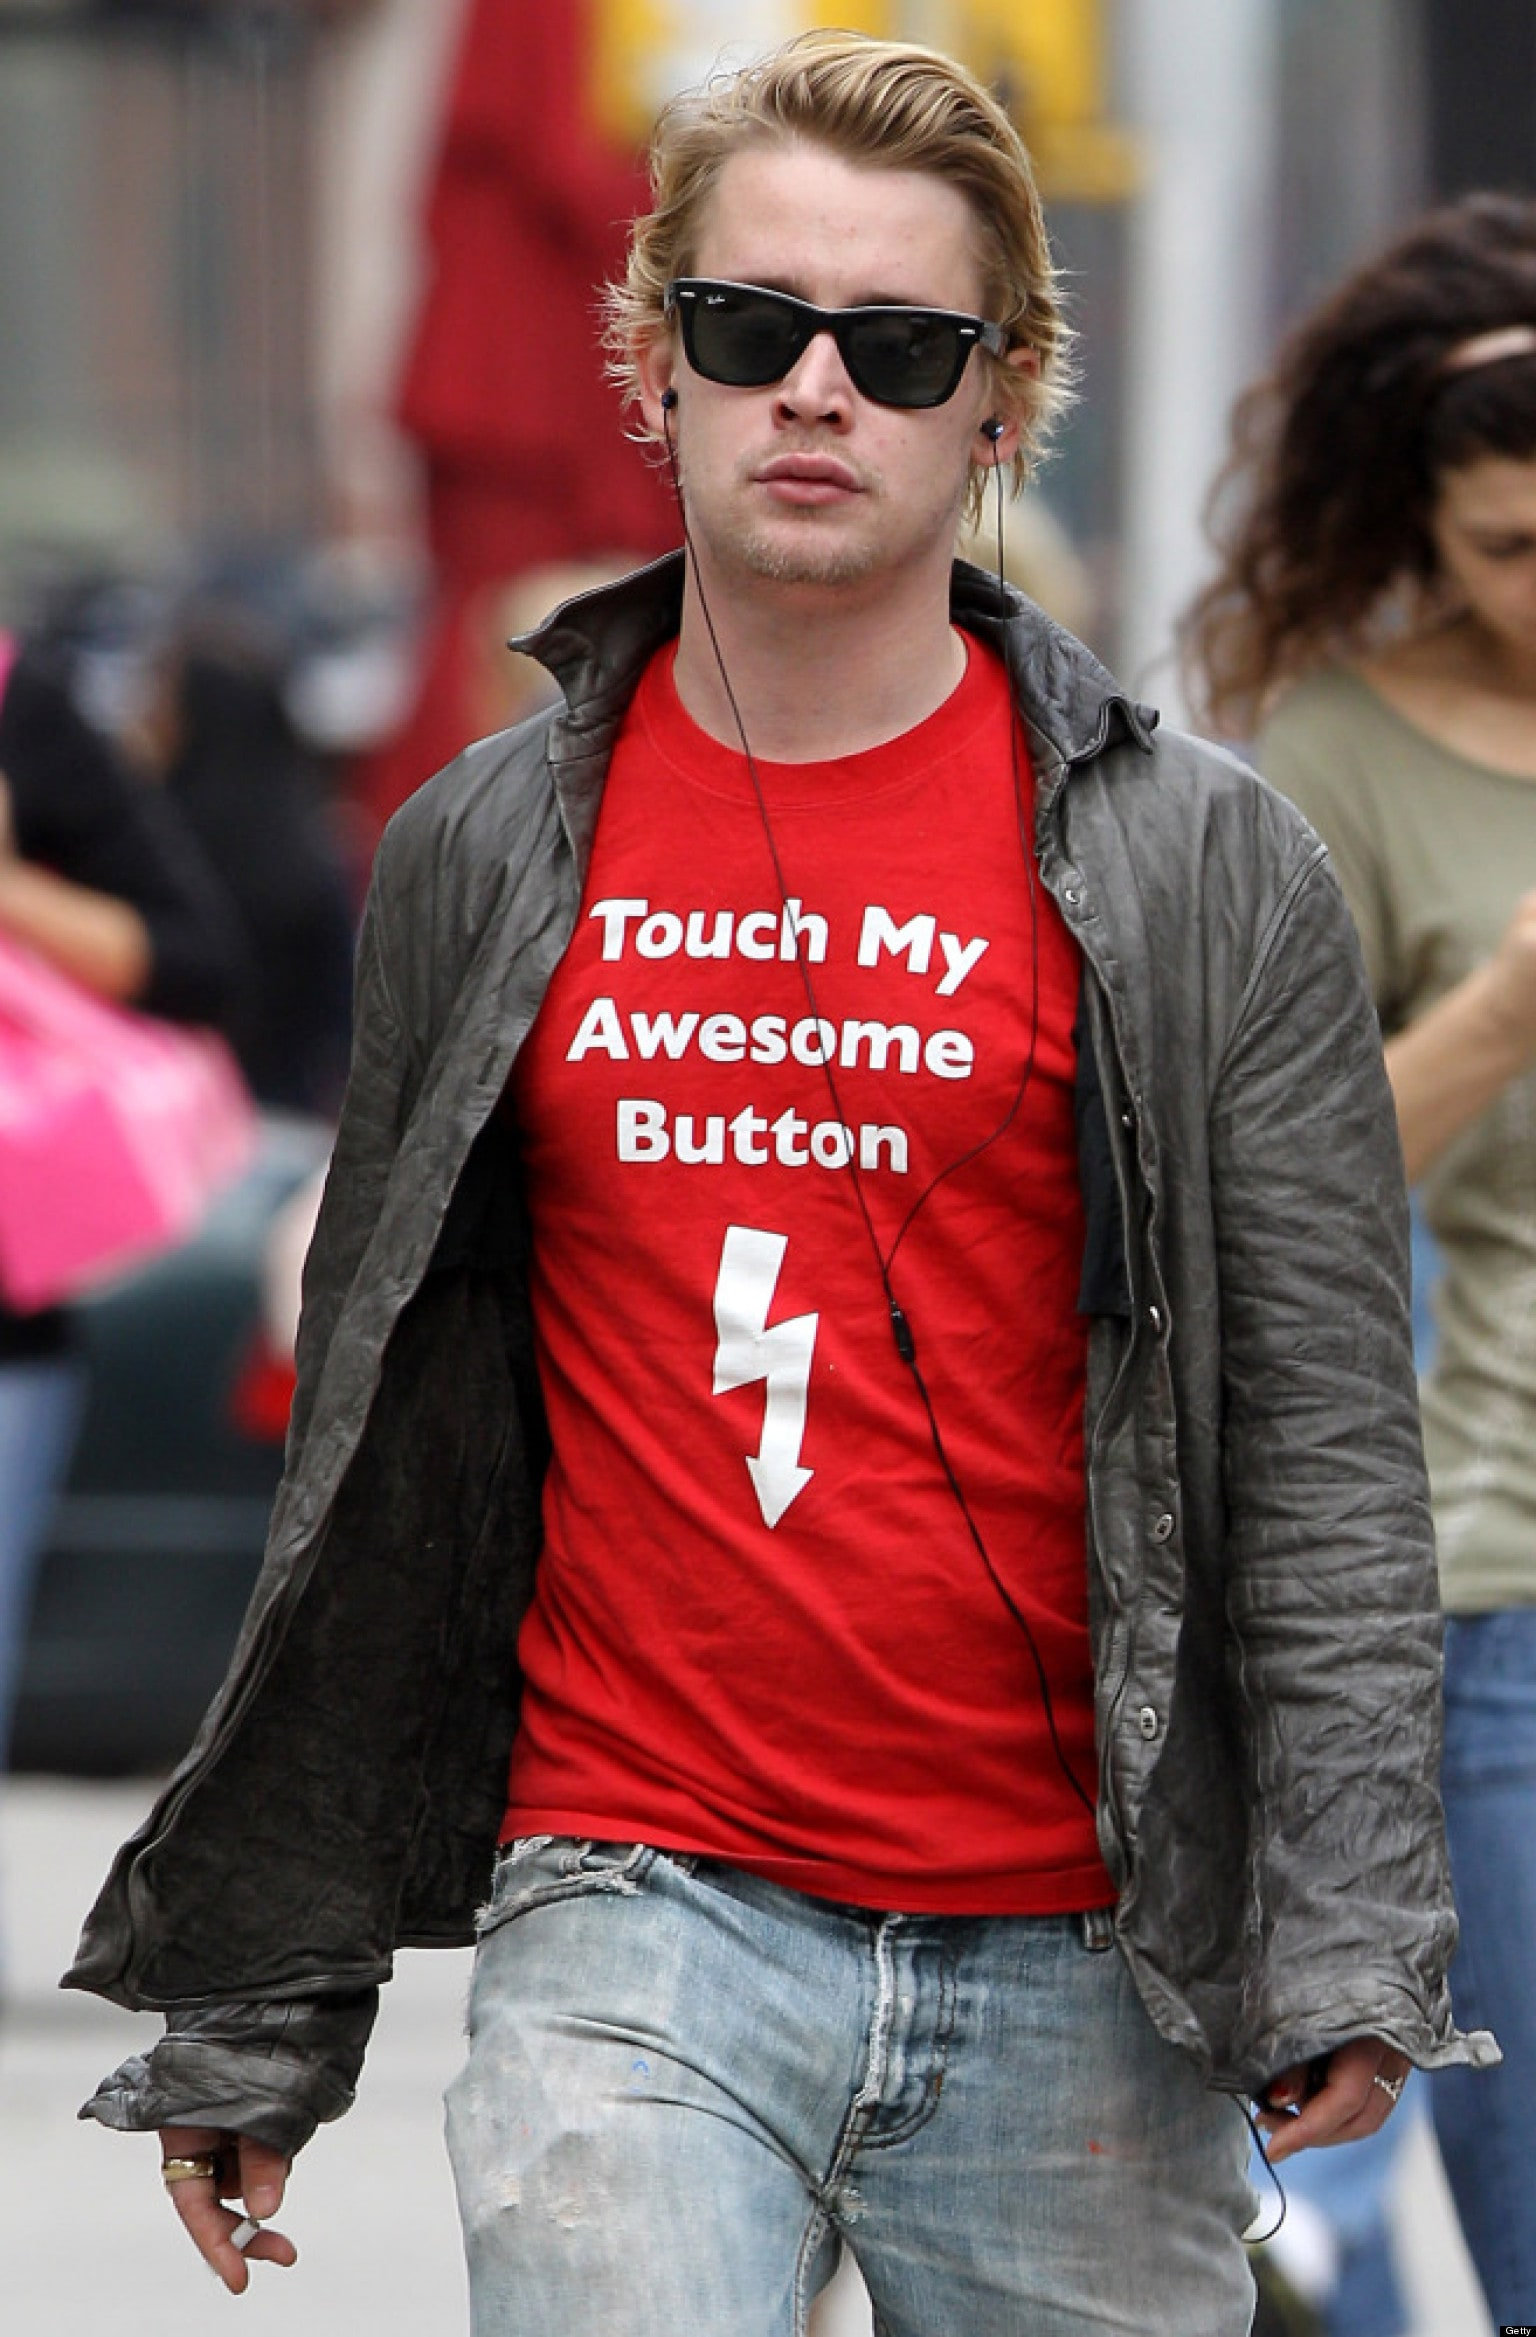 Macaulay Culkin For mobile